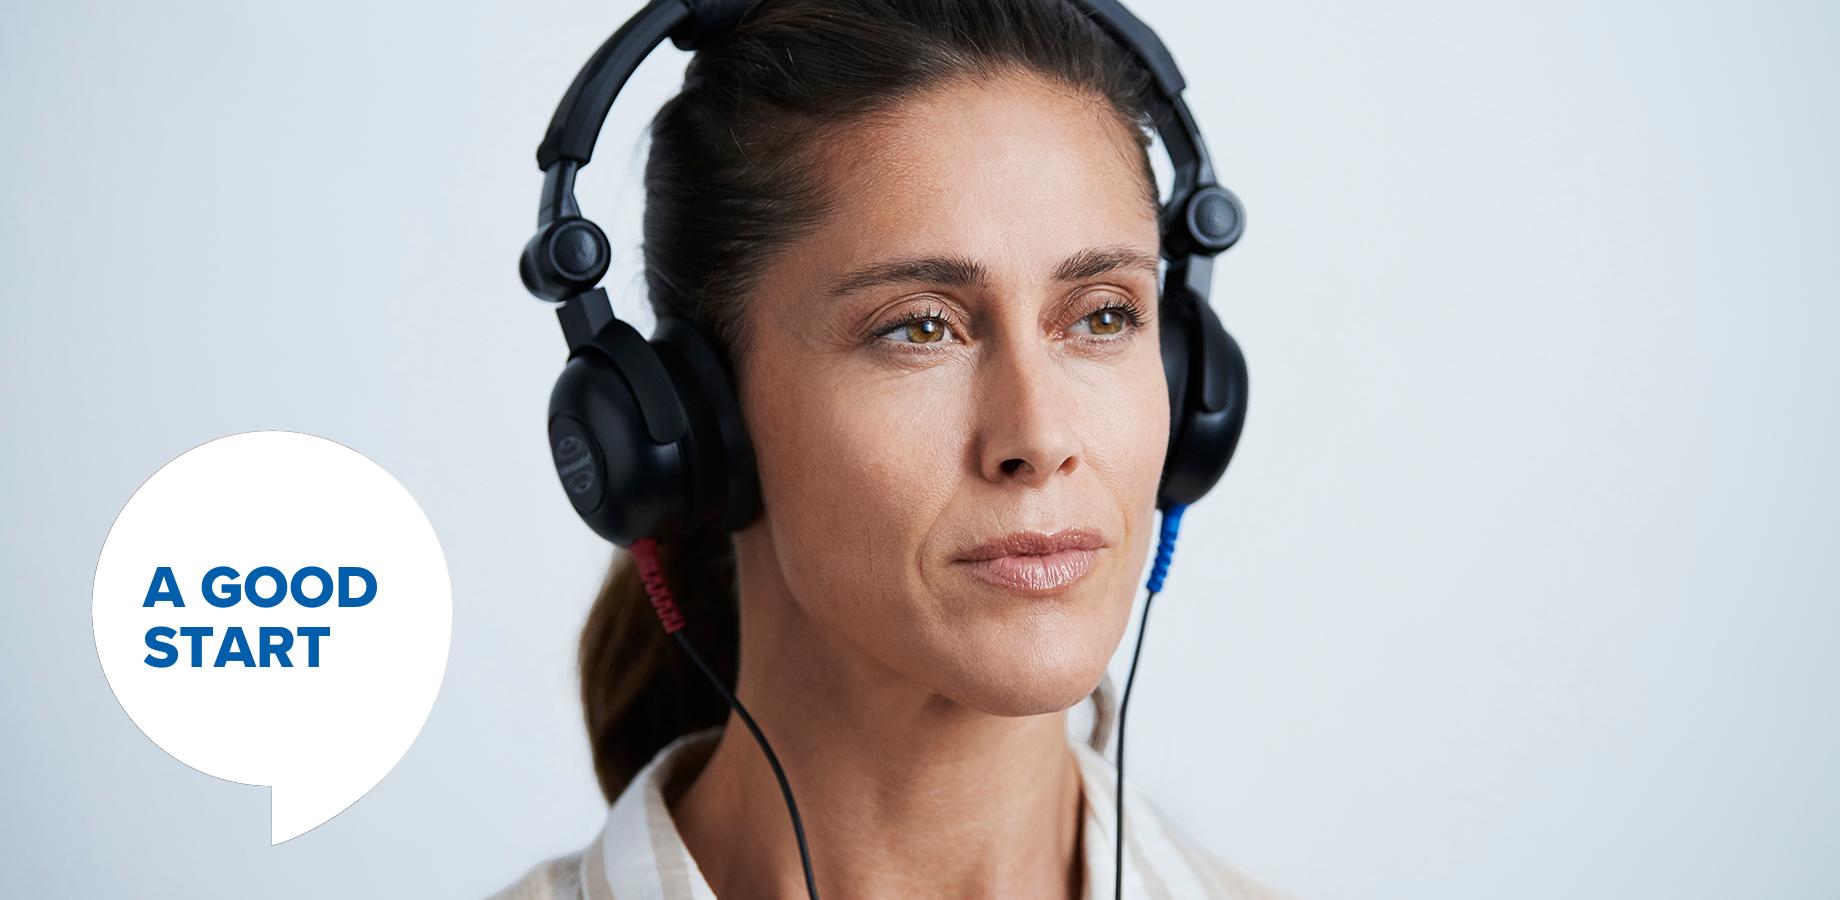 hearinglife_welcome_start